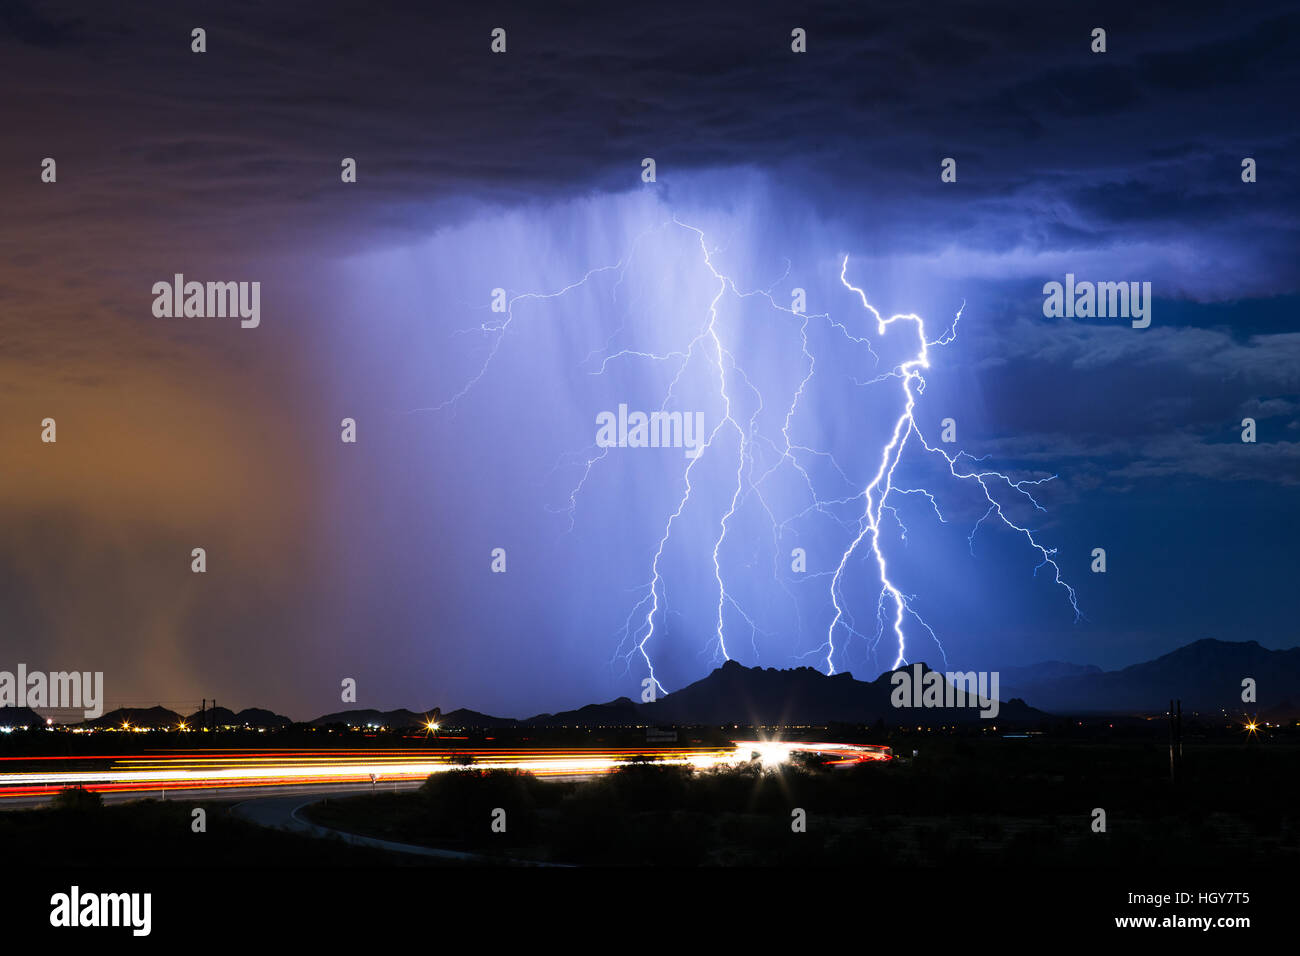 Lightning storm in Tucson, Arizona Stock Photo